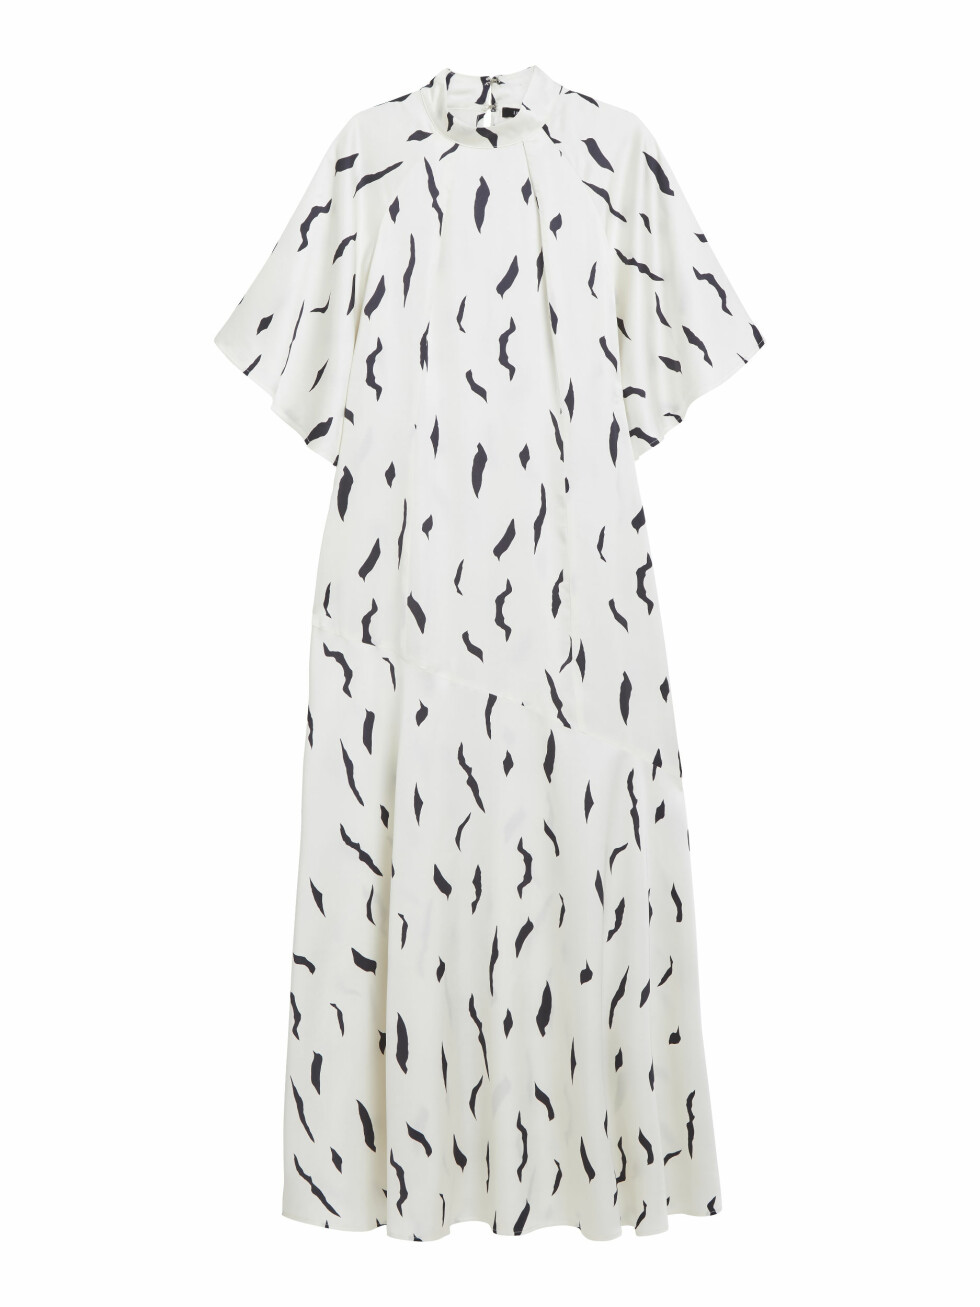 Mønstrete kjole (kr 800, Lindex).